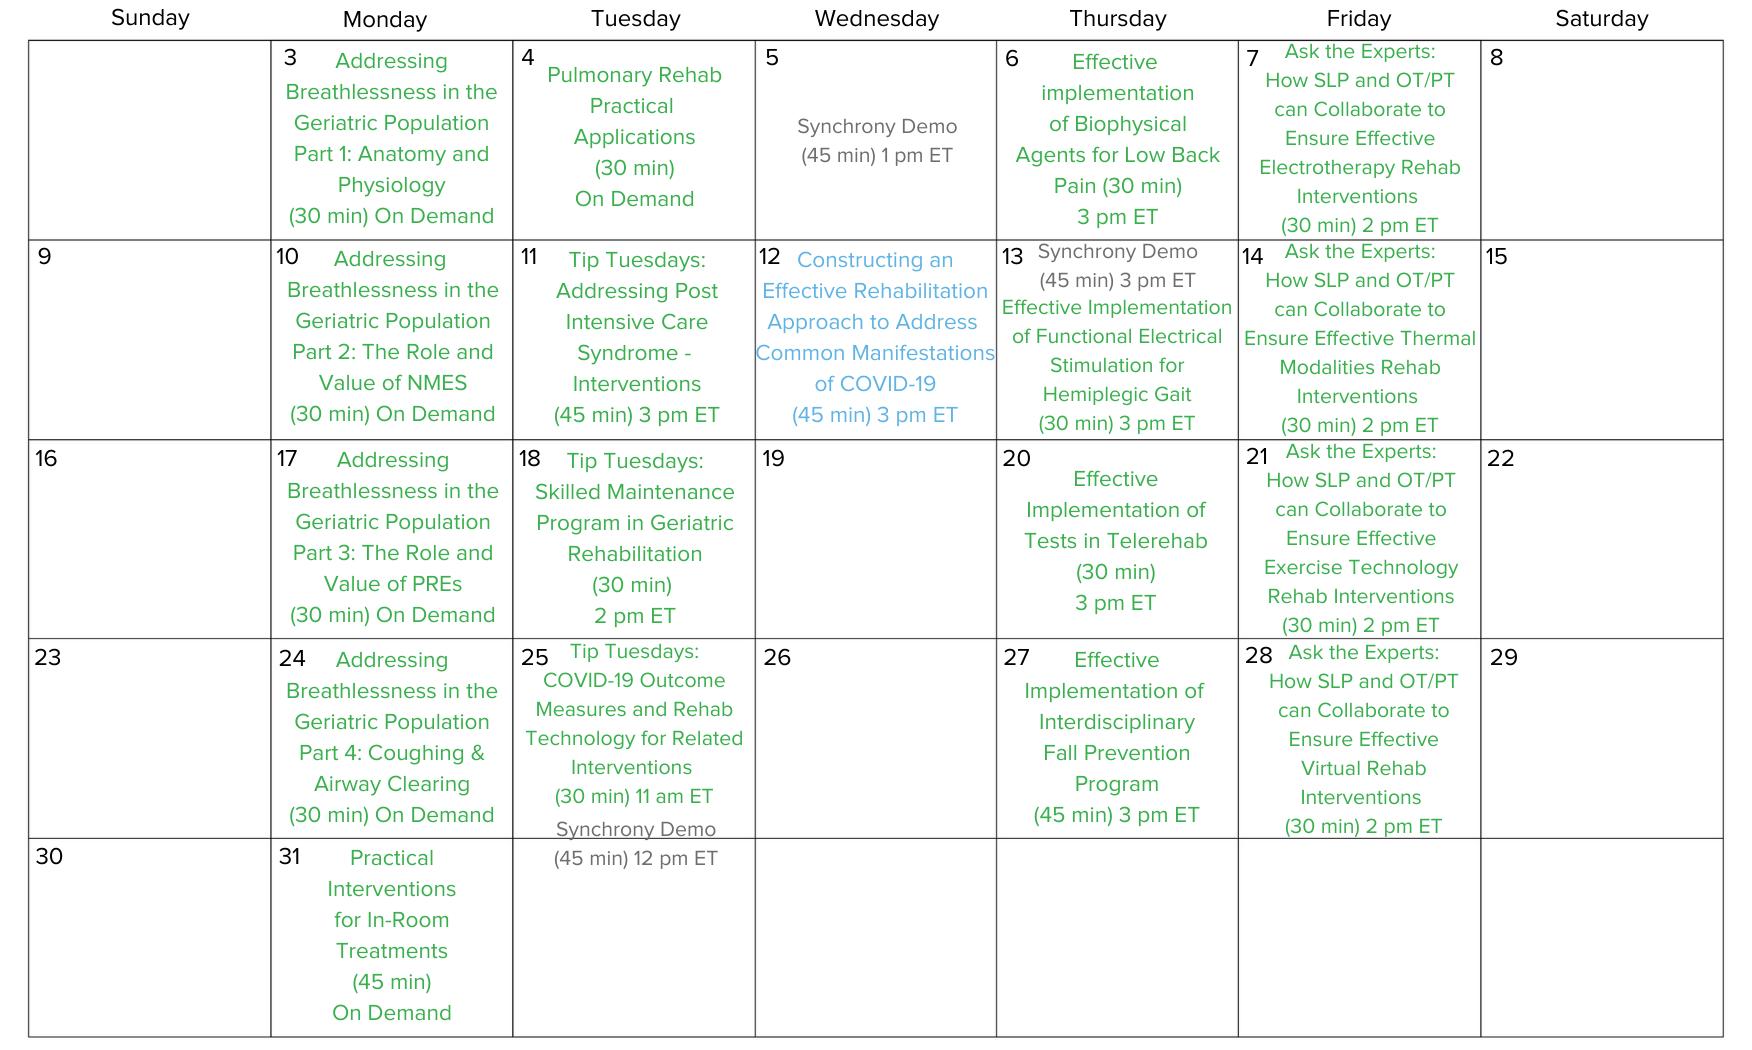 August 2020 Public Calendar_cropped for HubSpot-1